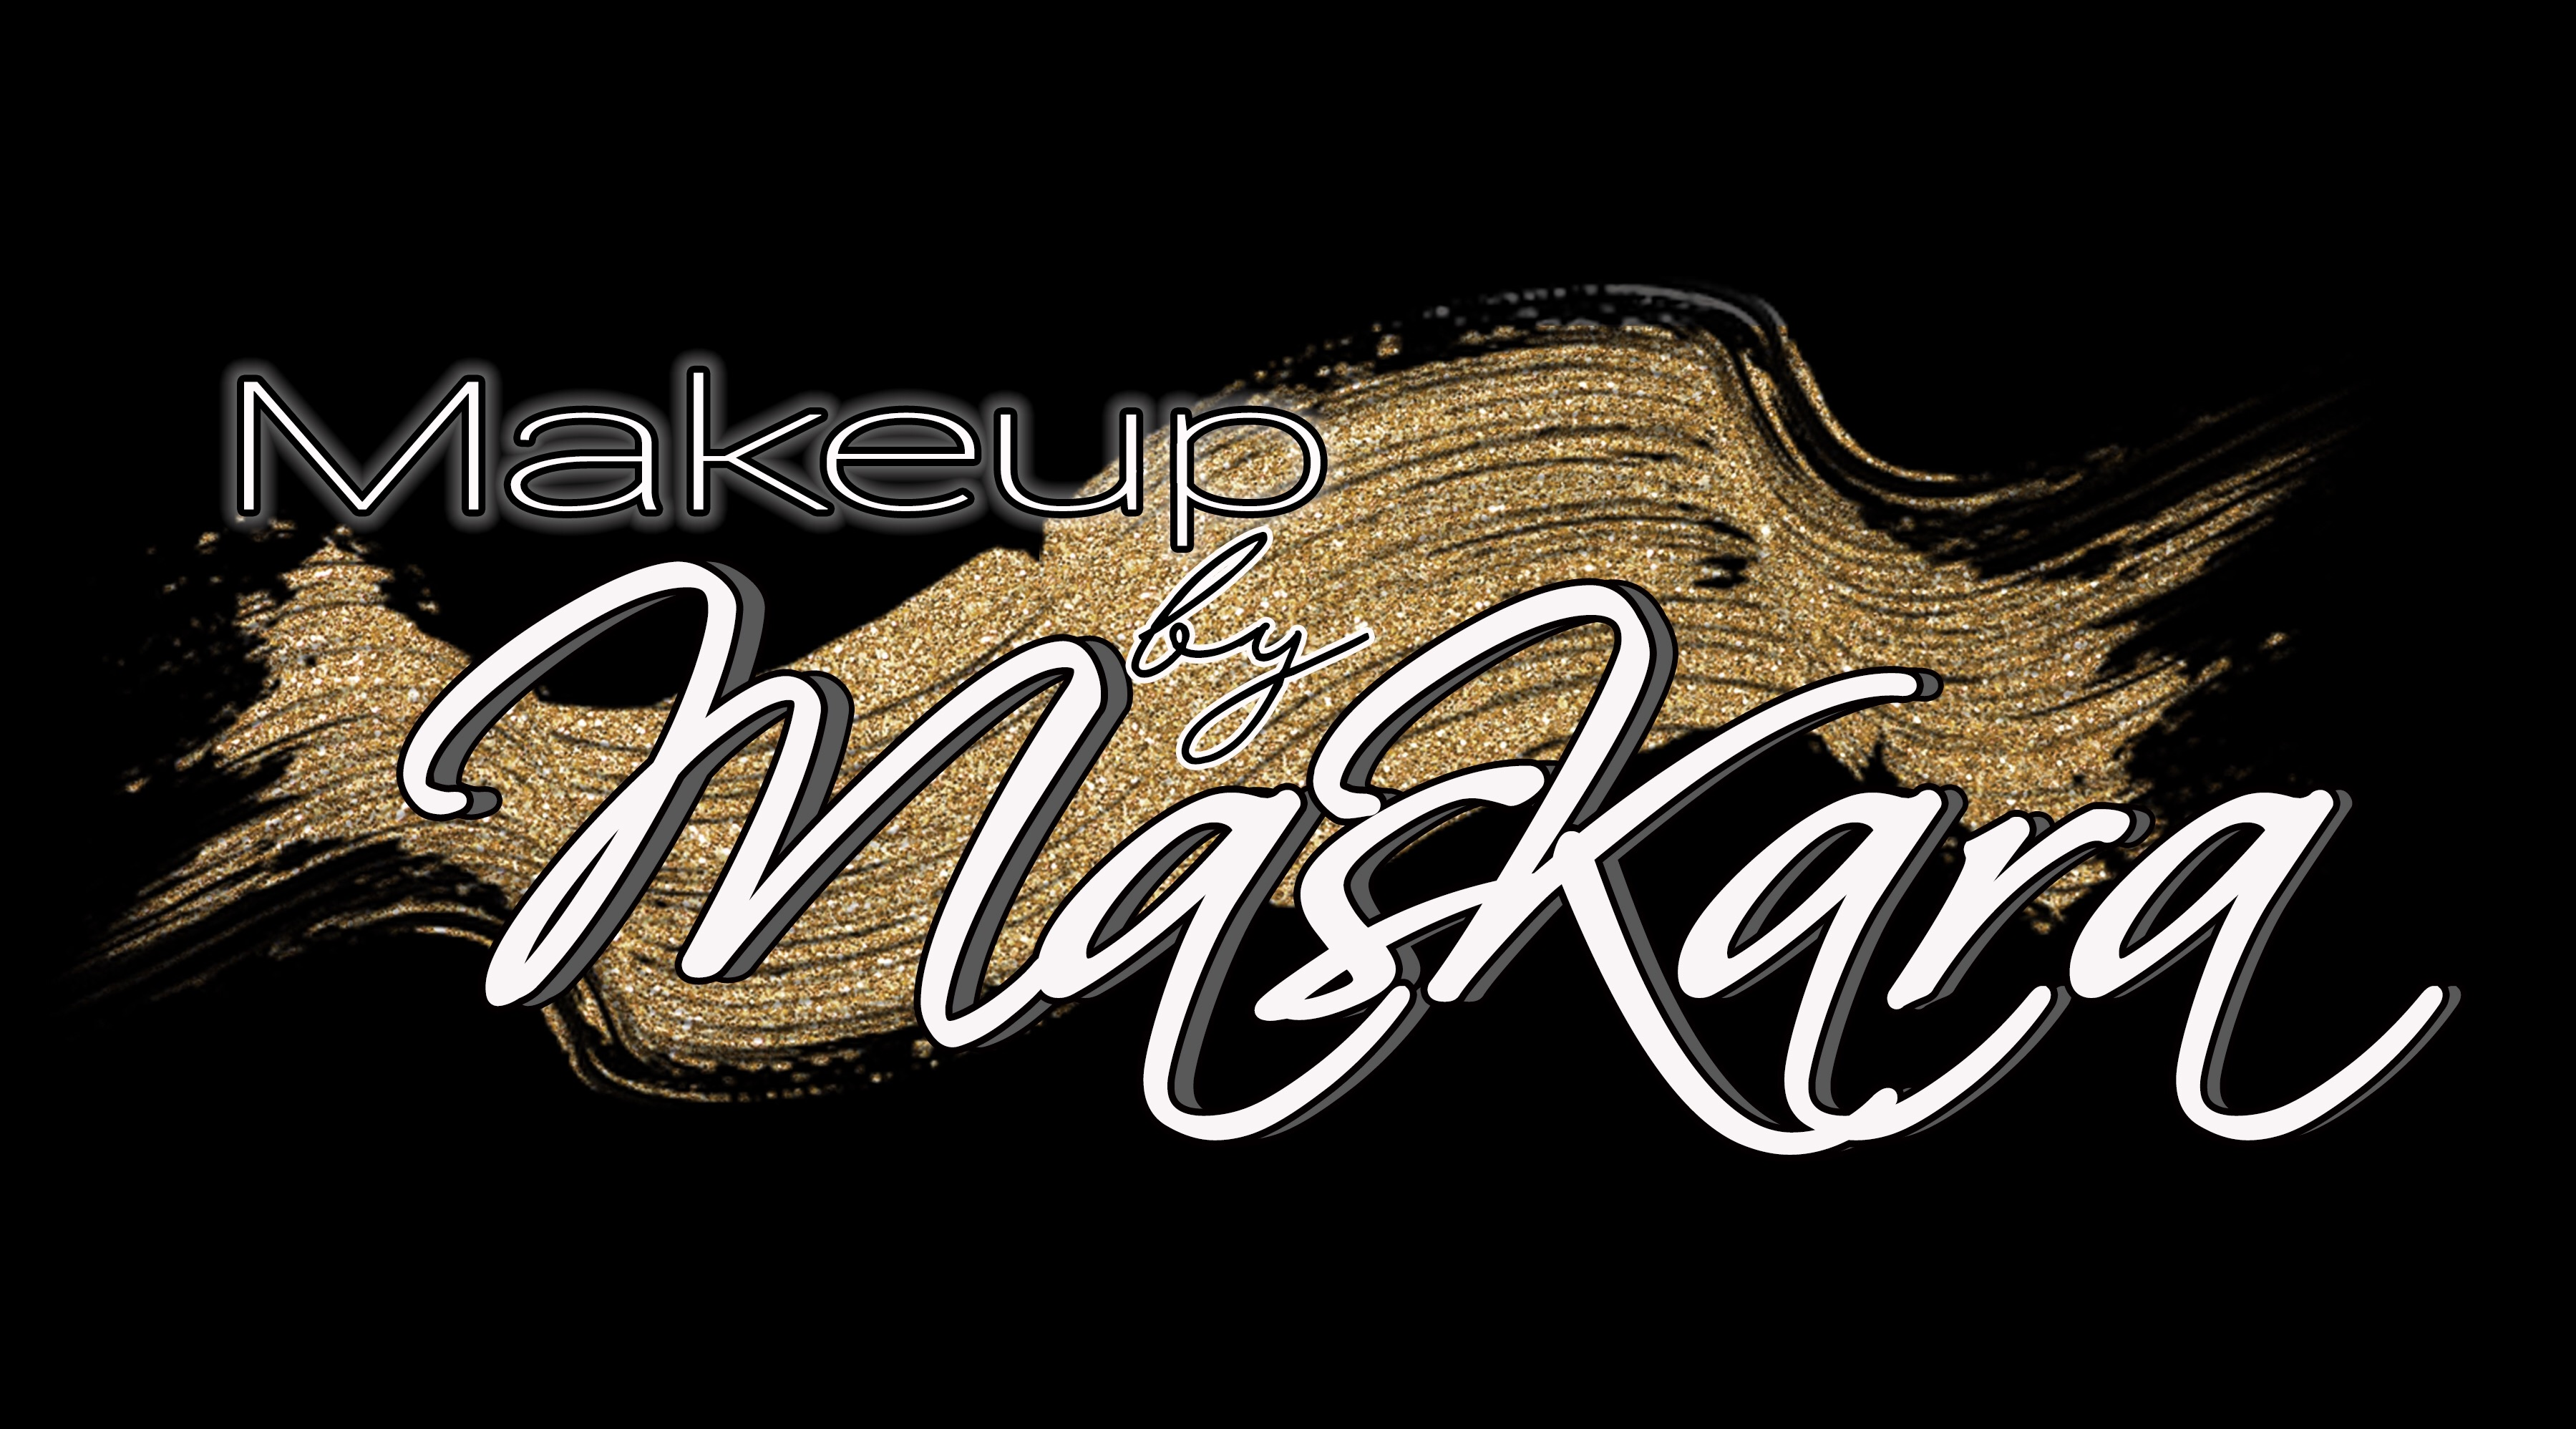 MakeupbyMasKara